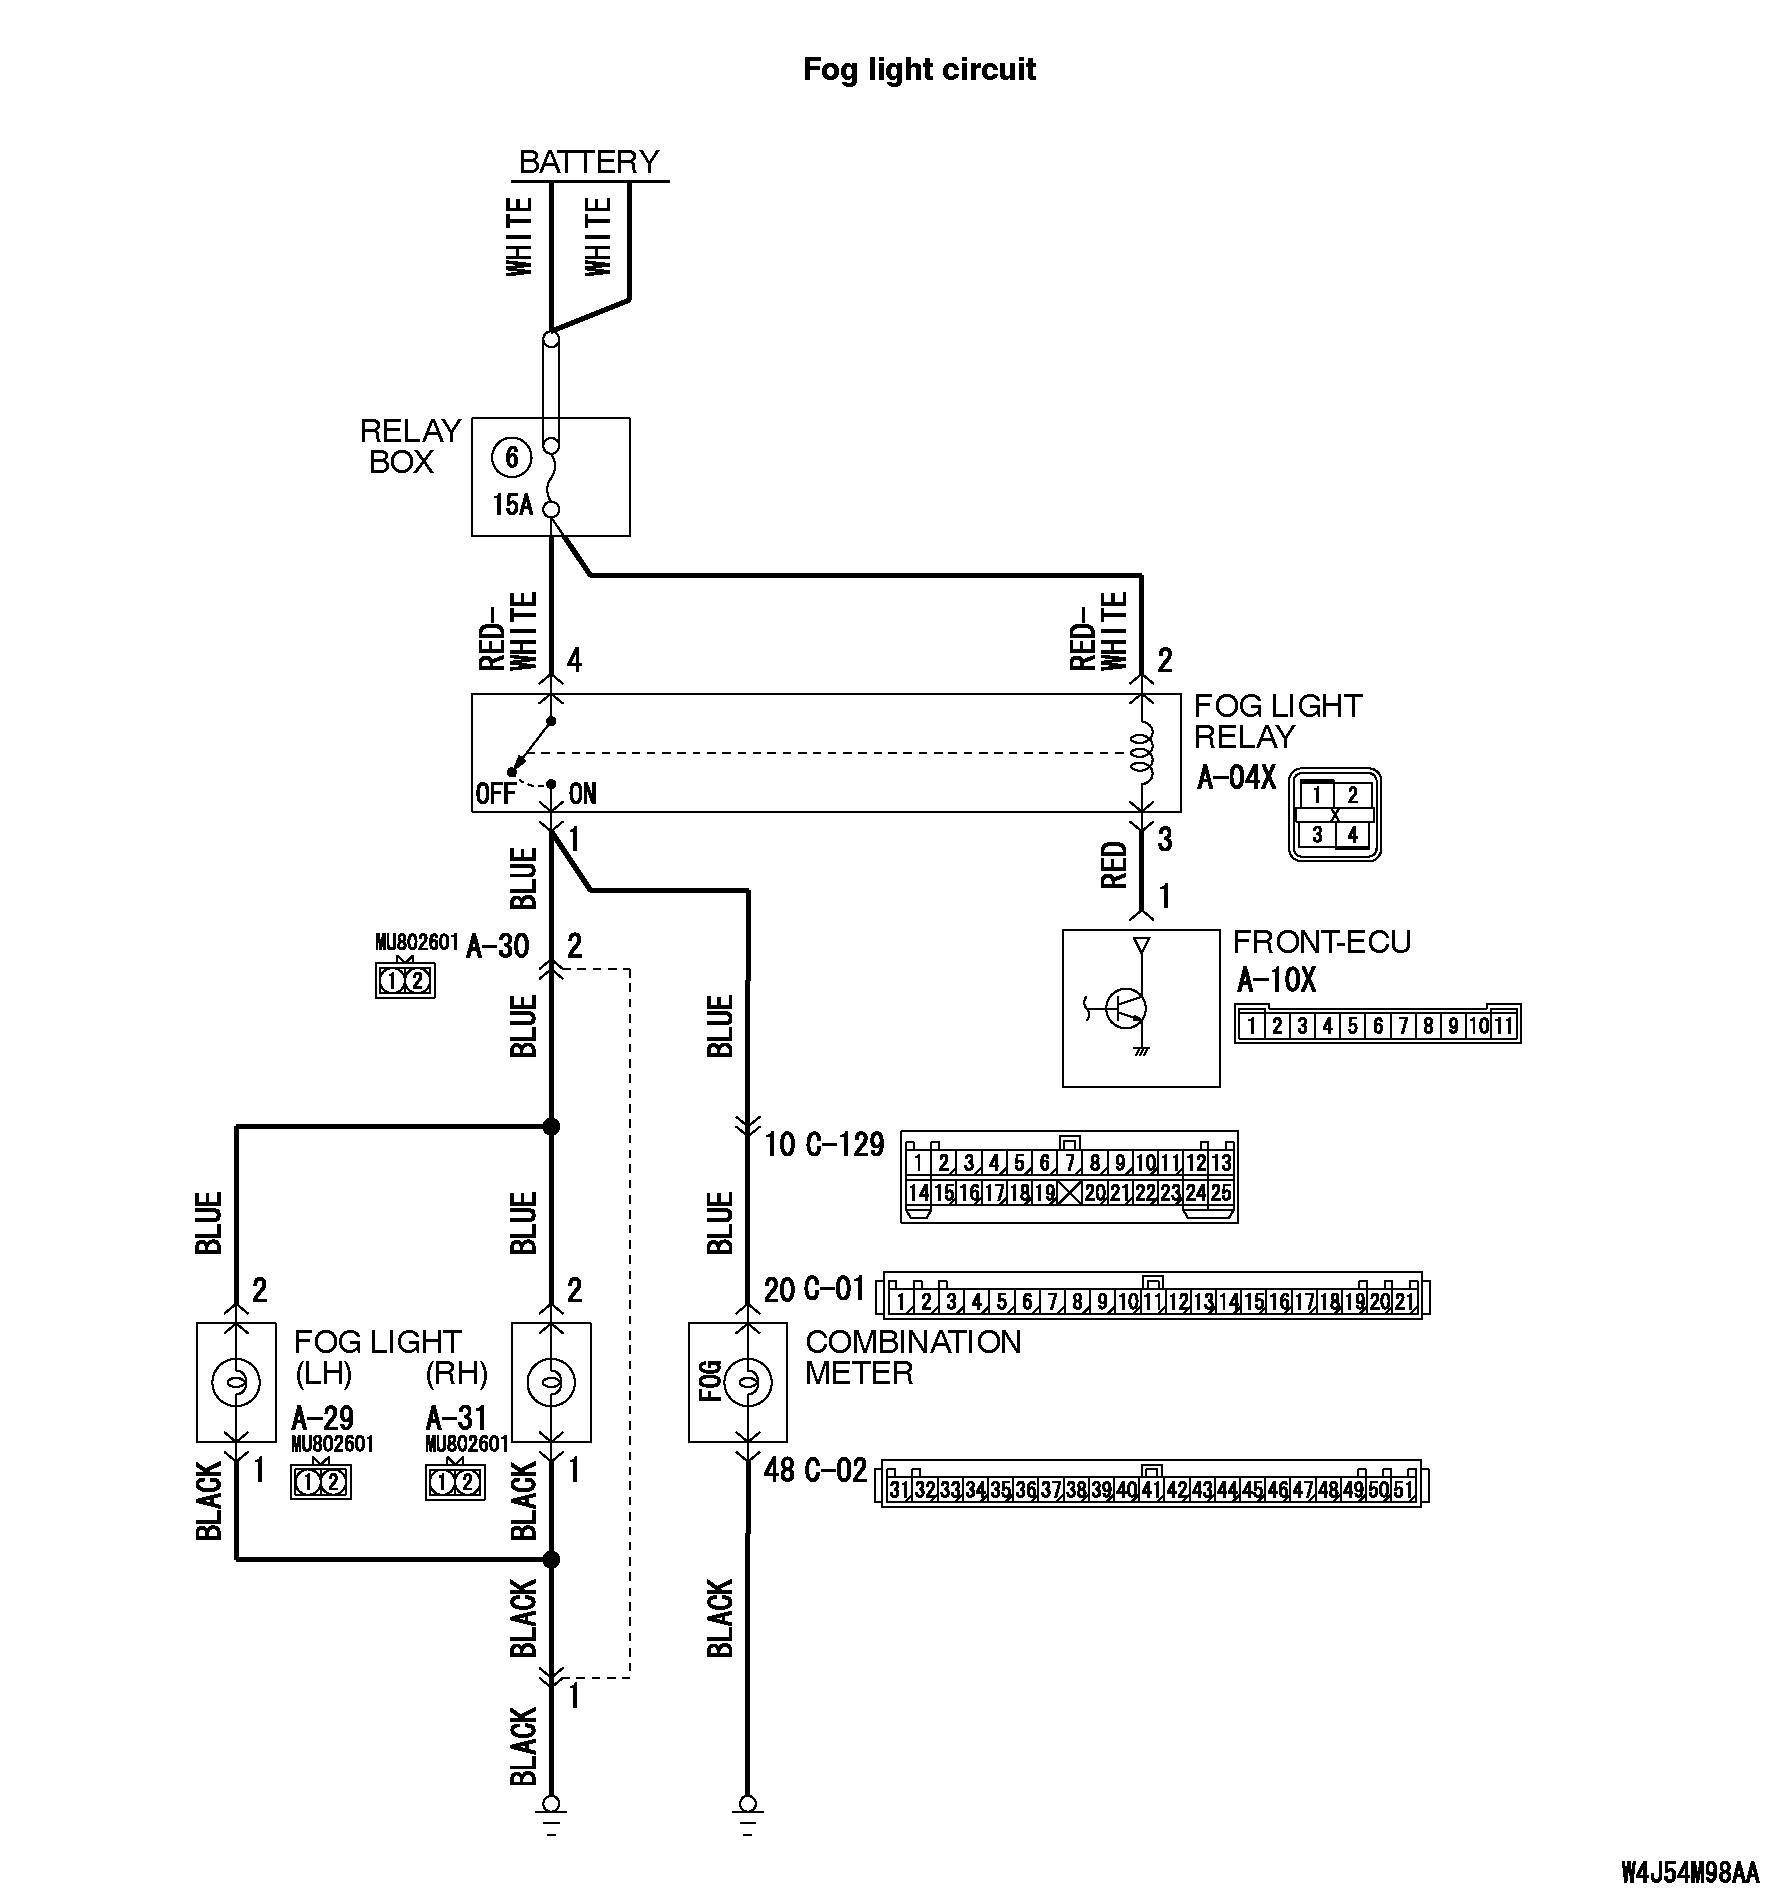 Diagram Rsx Fog Light Wire Diagram Full Version Hd Quality Wire Diagram Diagramcovinh Gisbertovalori It